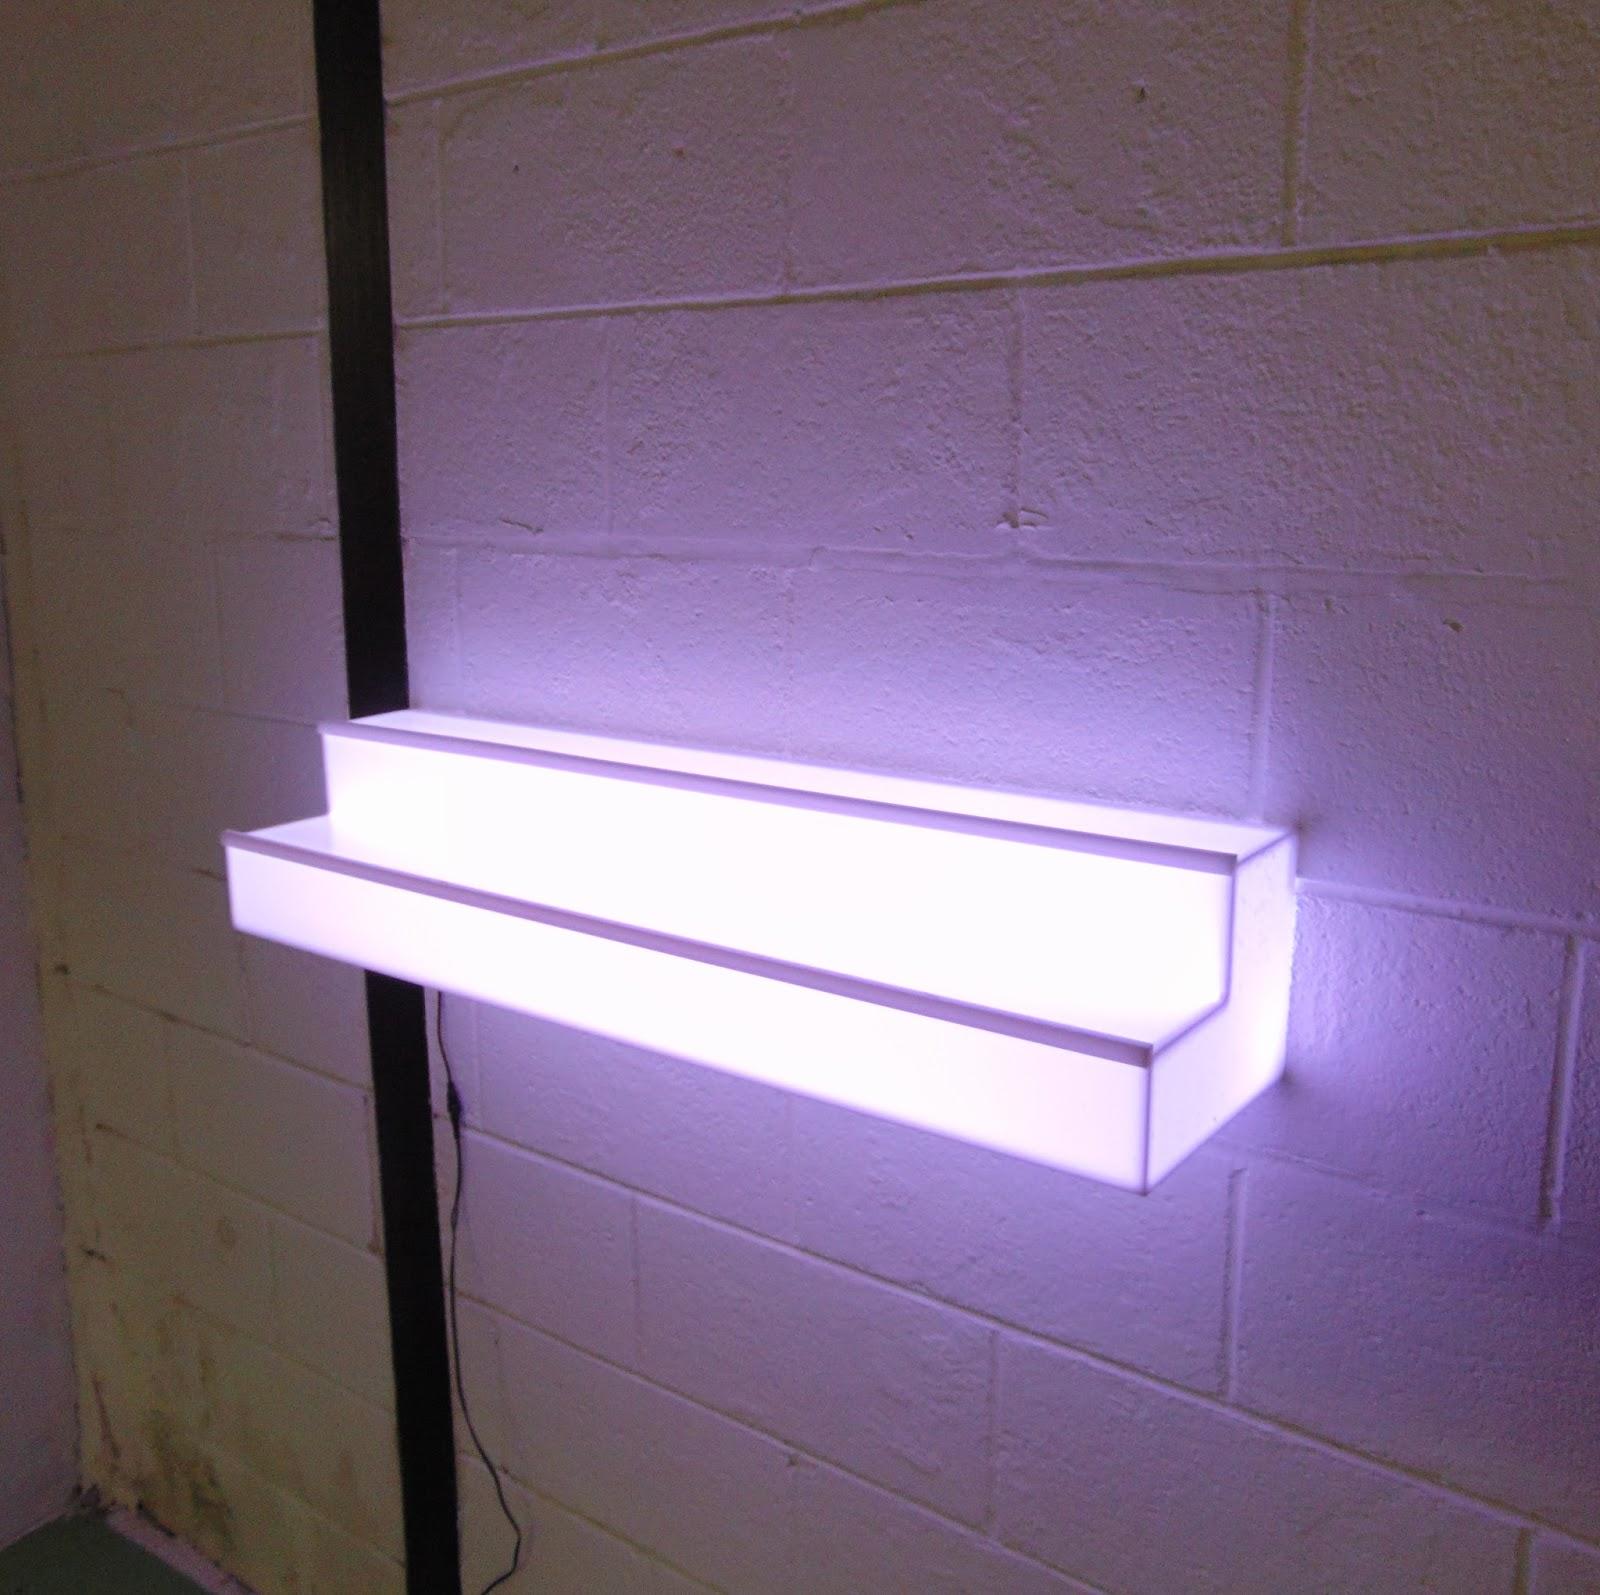 Barchefs Light Up Shelf Designs